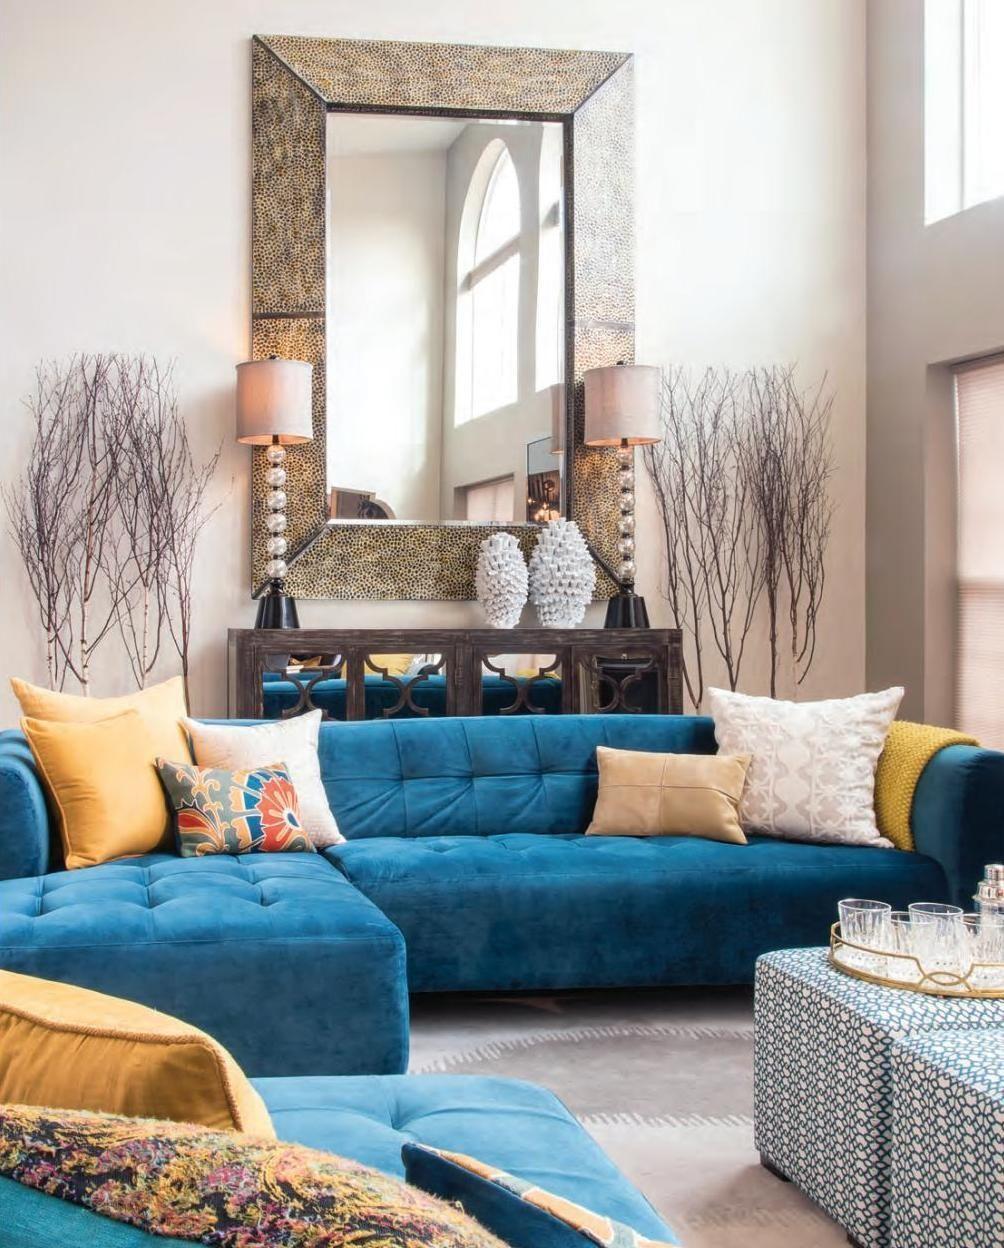 Home Interior Color Ideas: 15+ Alluring Interior Painting Joanna Gaines Ideas In 2020